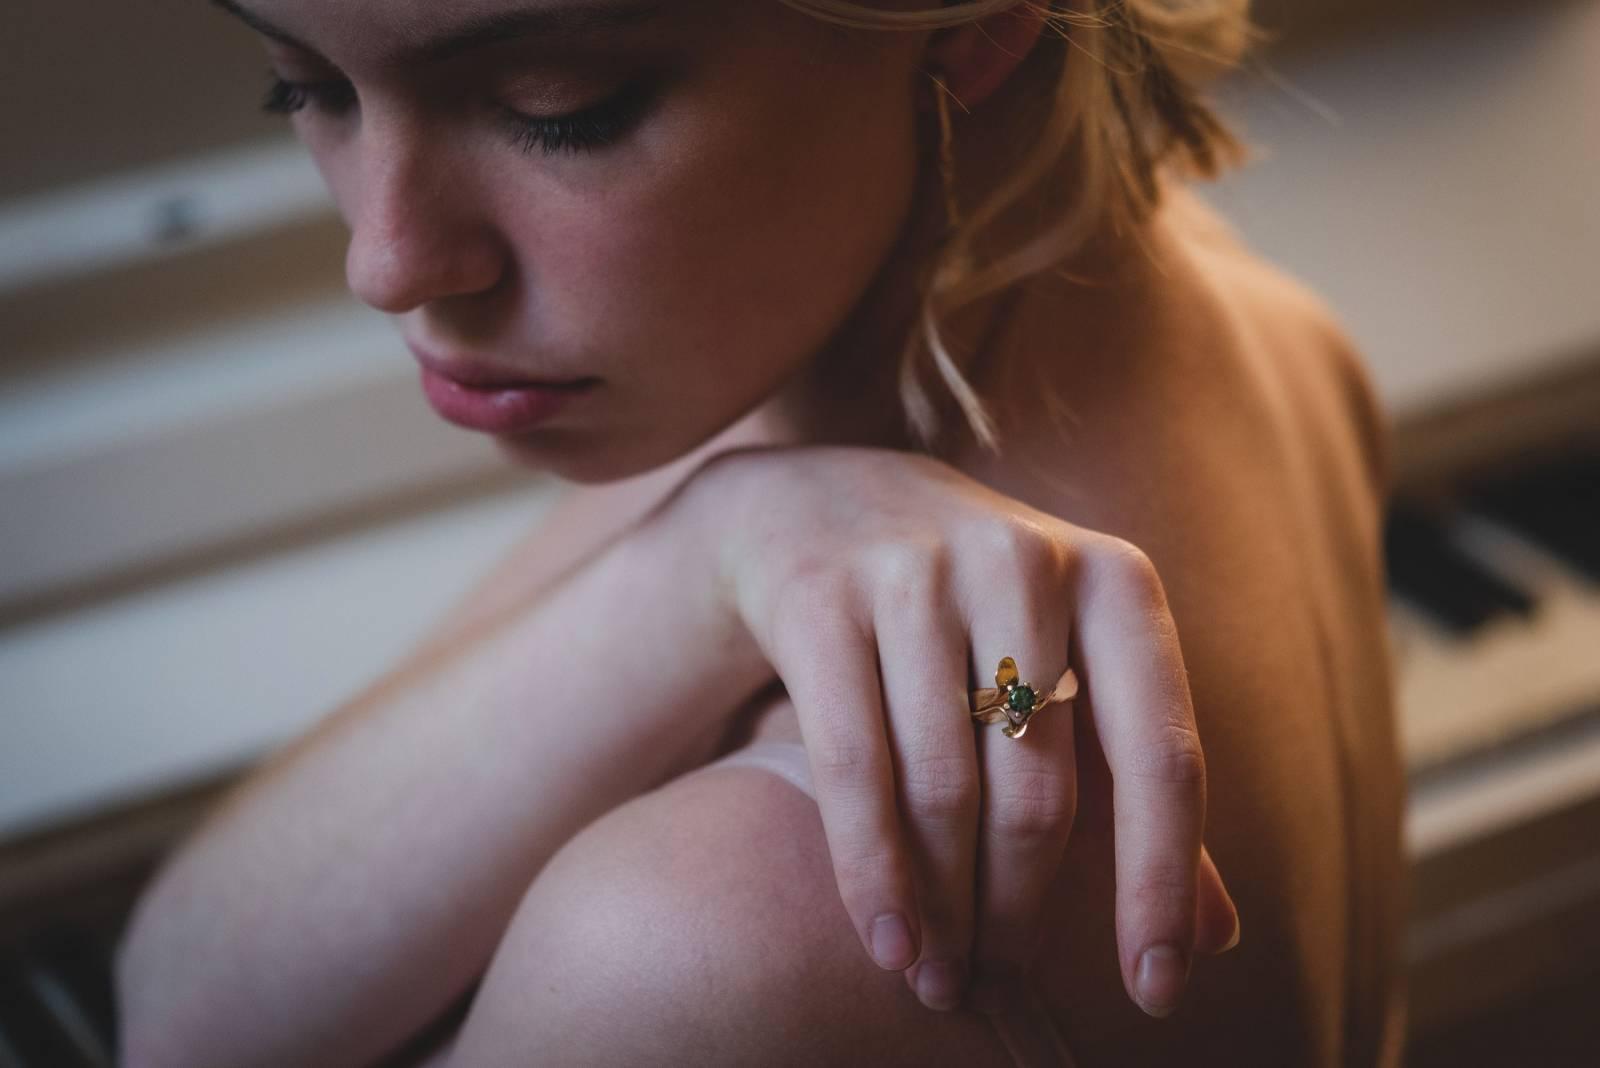 Nathalie Swinnen - Juwelen - Bruidsjuwelen - Verlovingsring - Trouwring - House of Weddings - 15